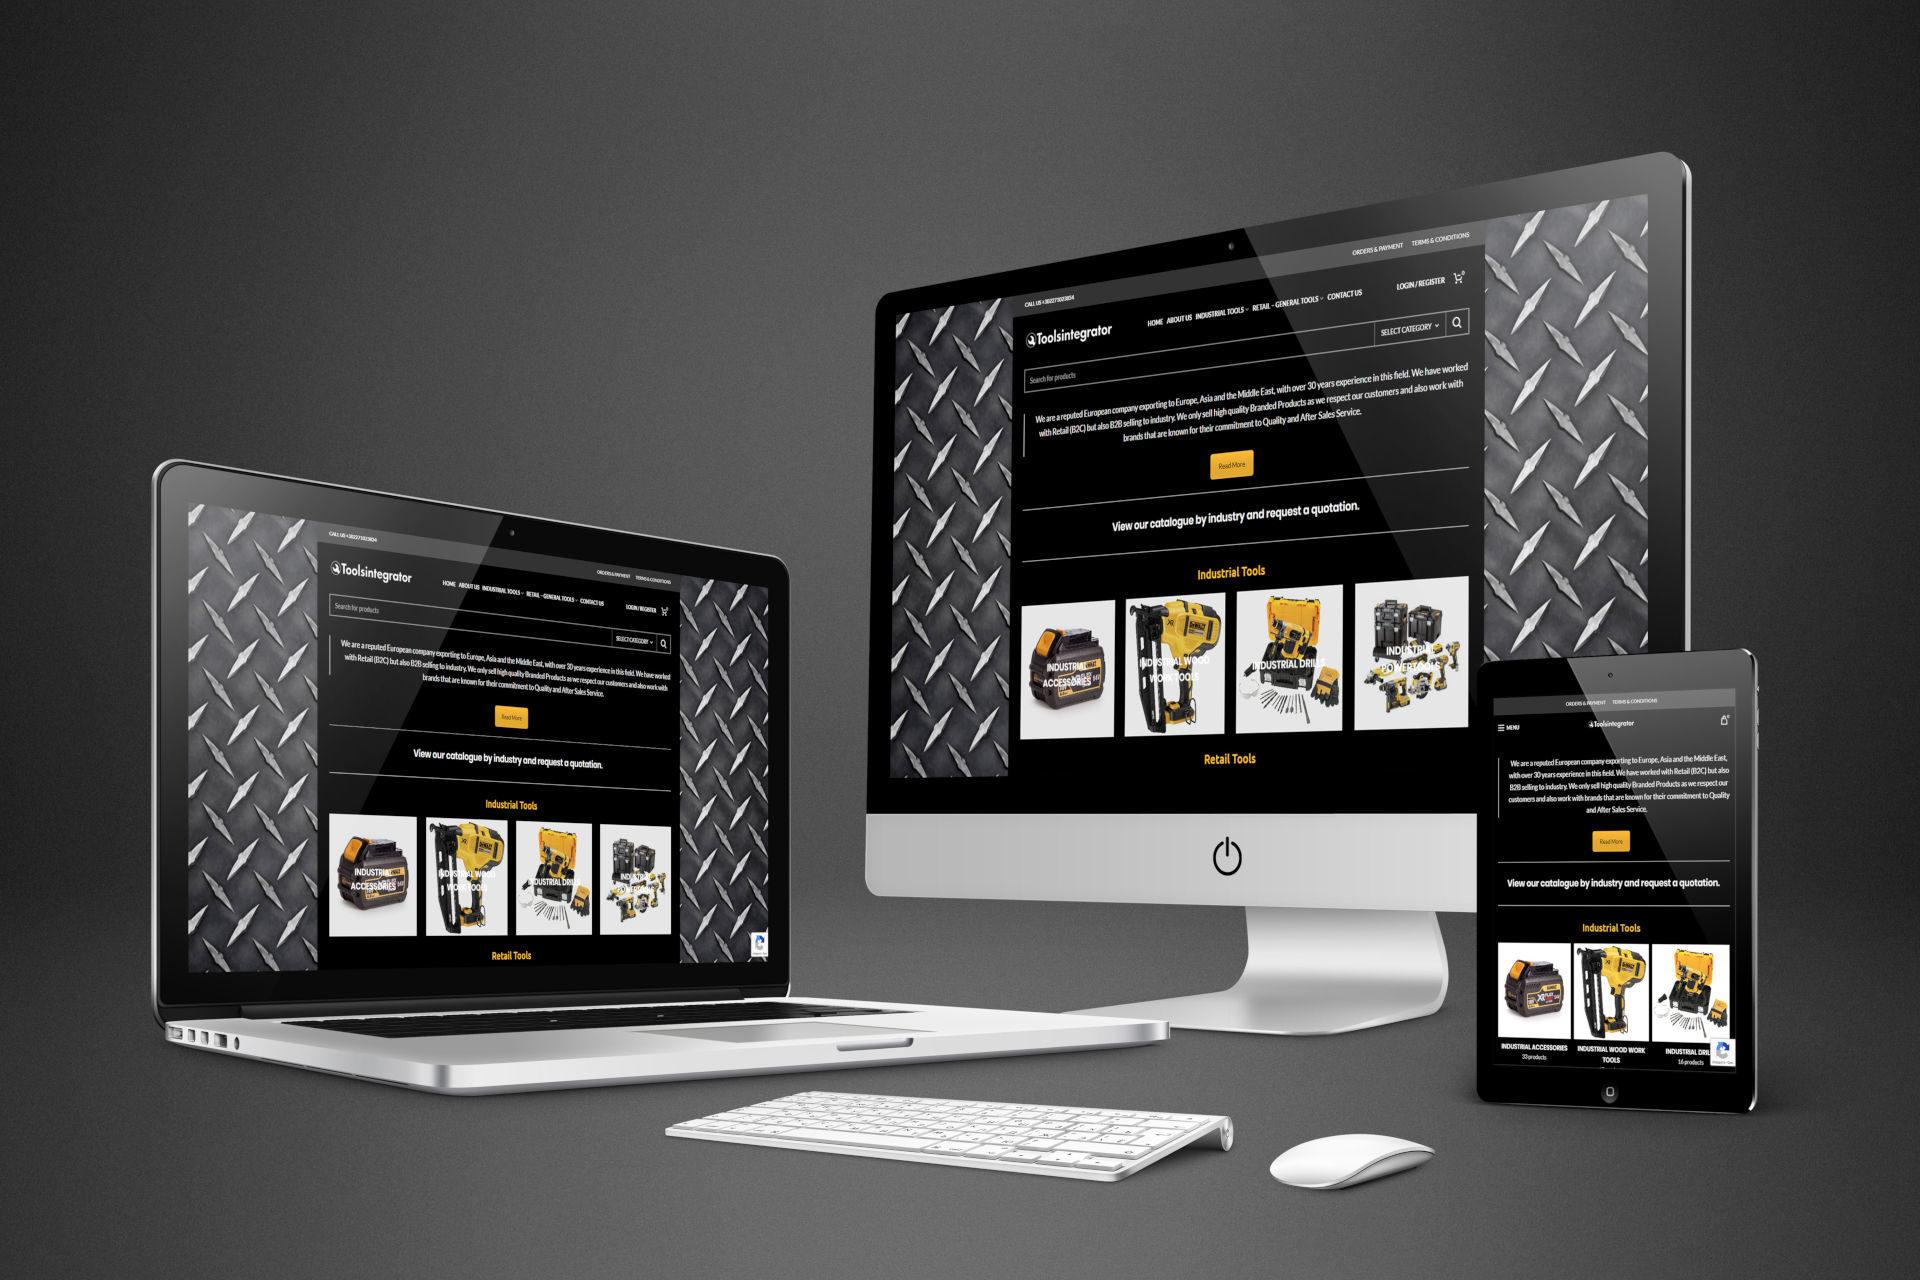 Toolsintegrator featured image